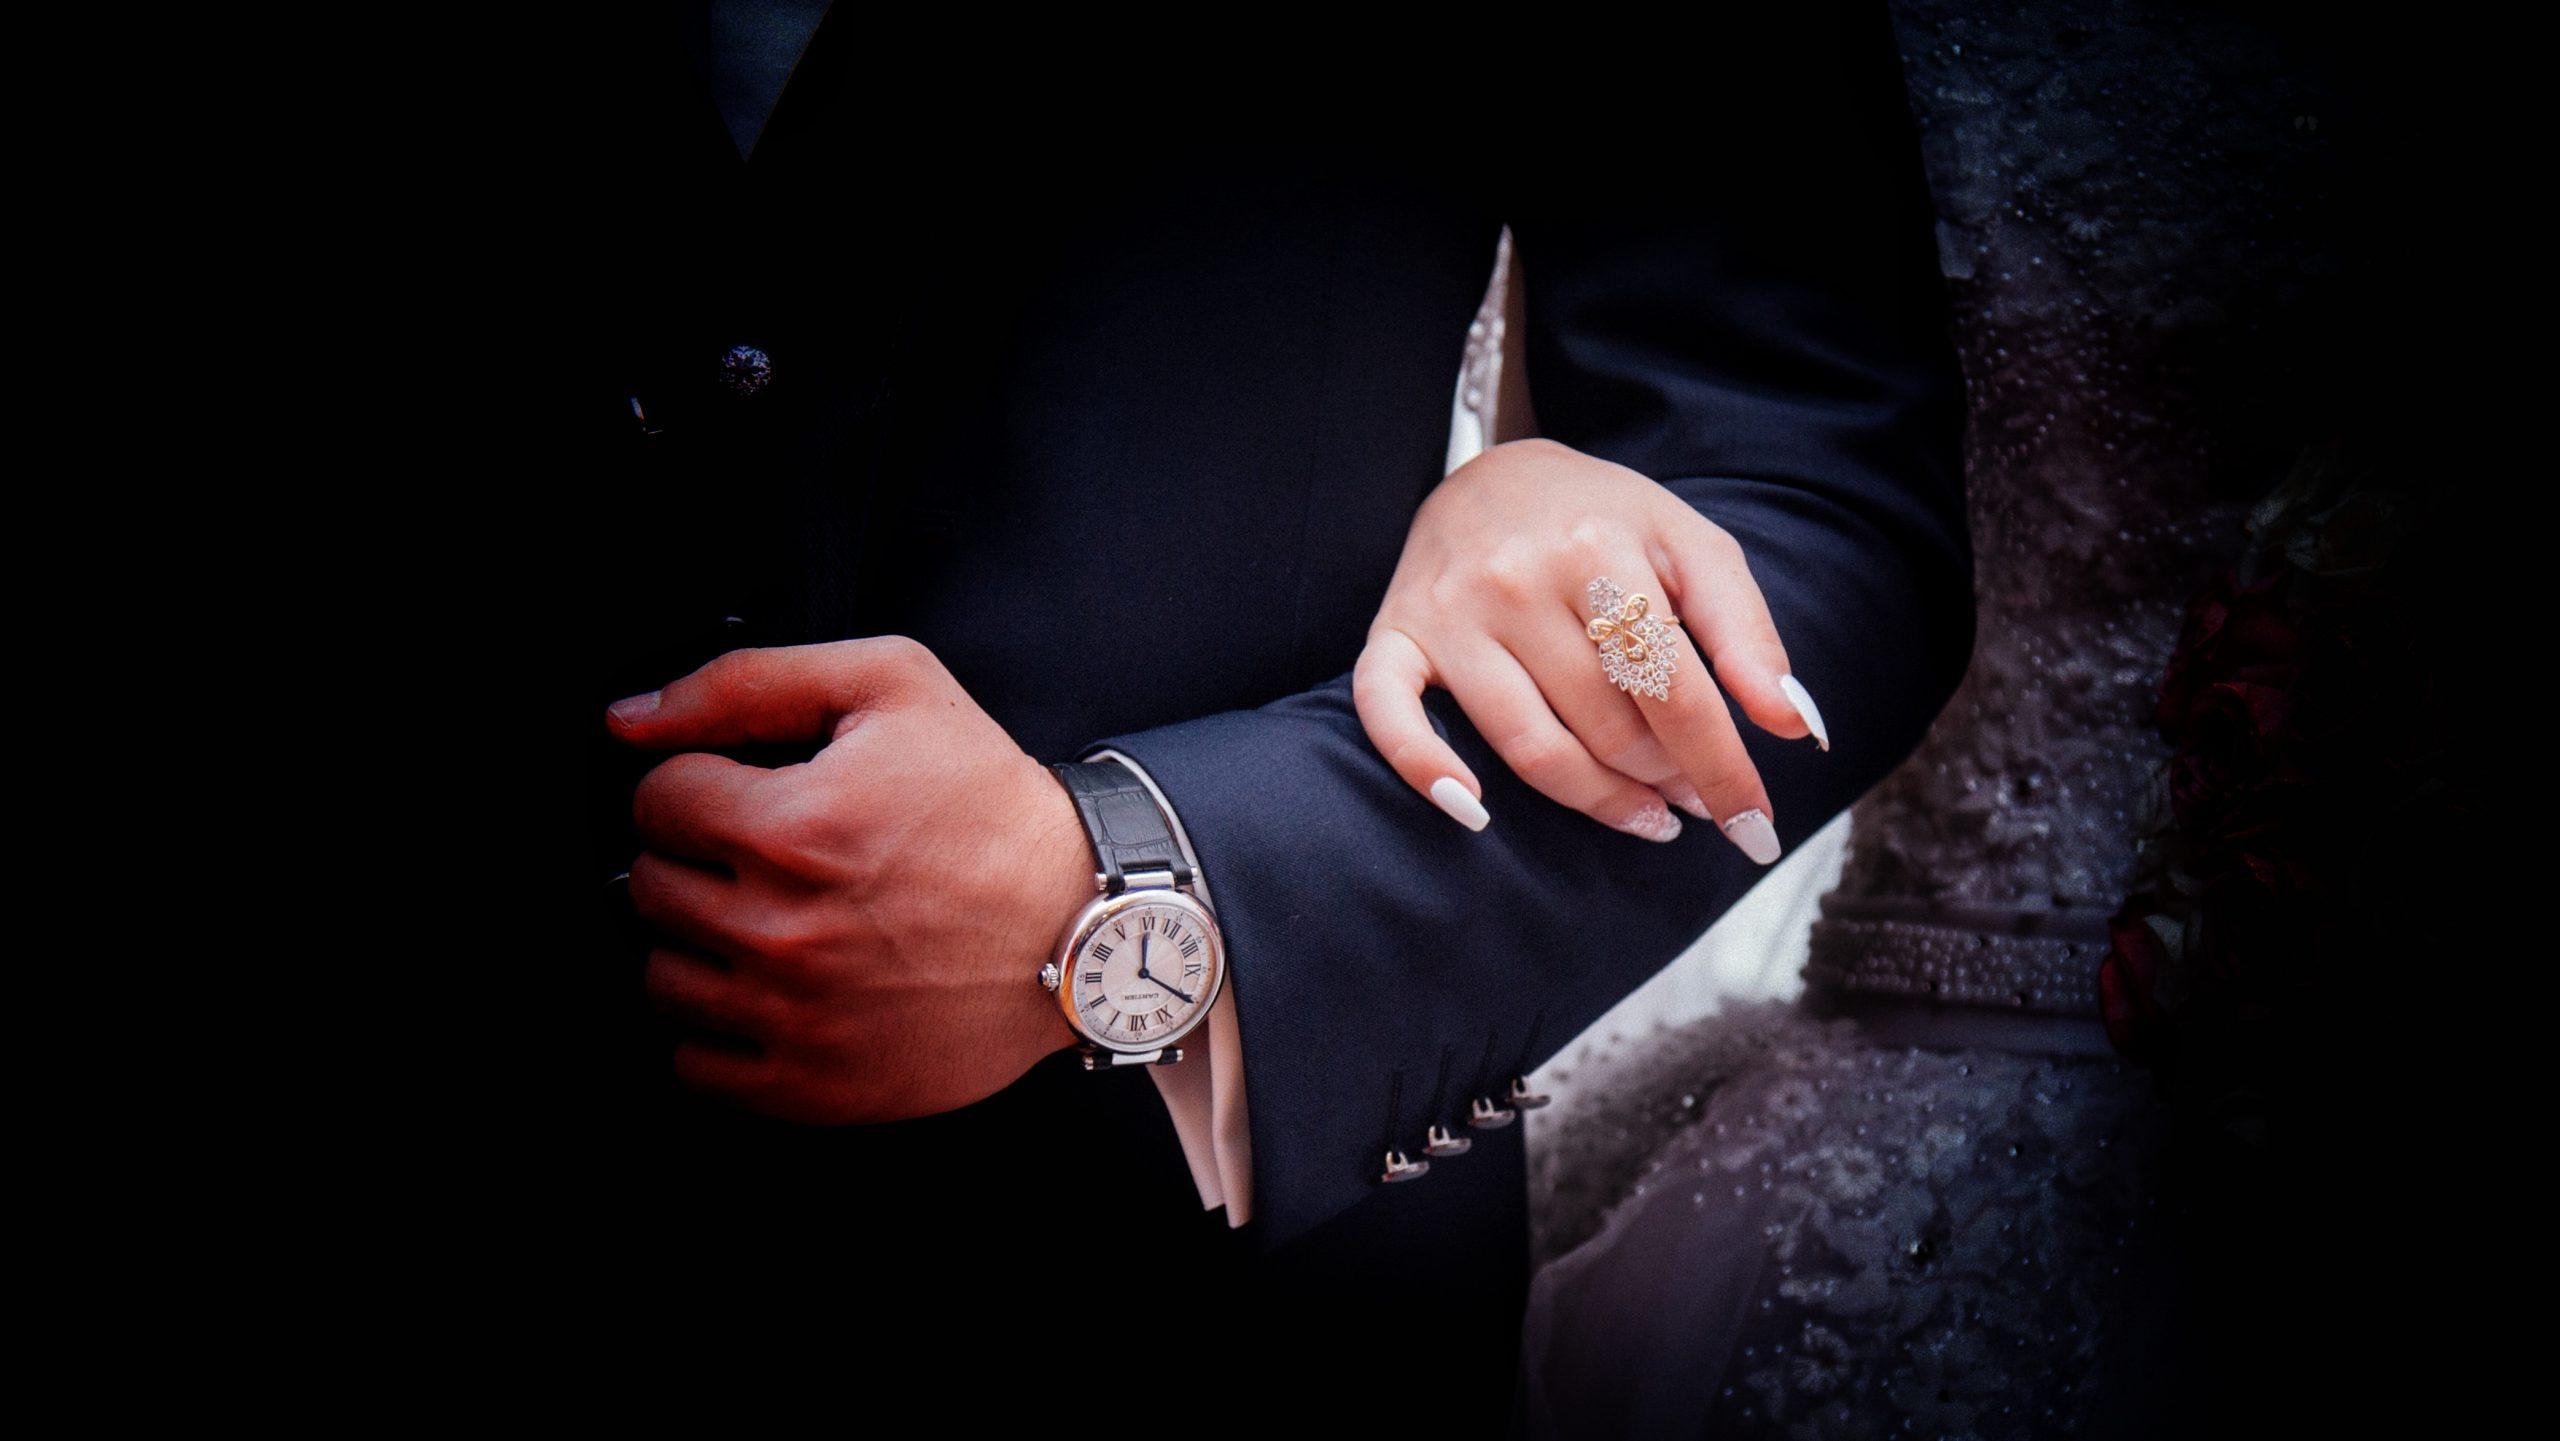 A couple's hand